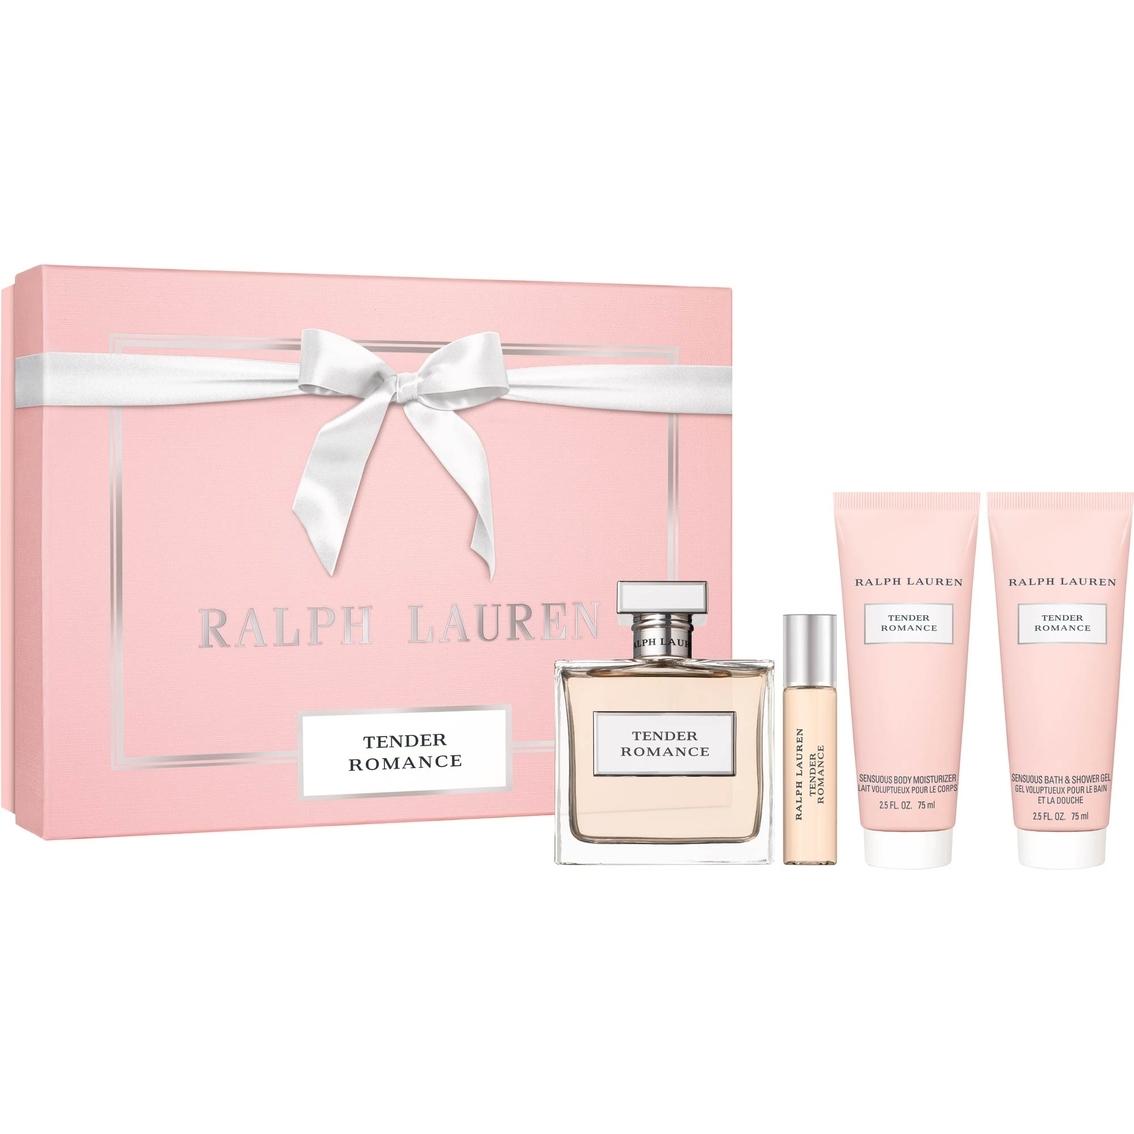 Aaralph lauren tender romance perfume 4 pcs set